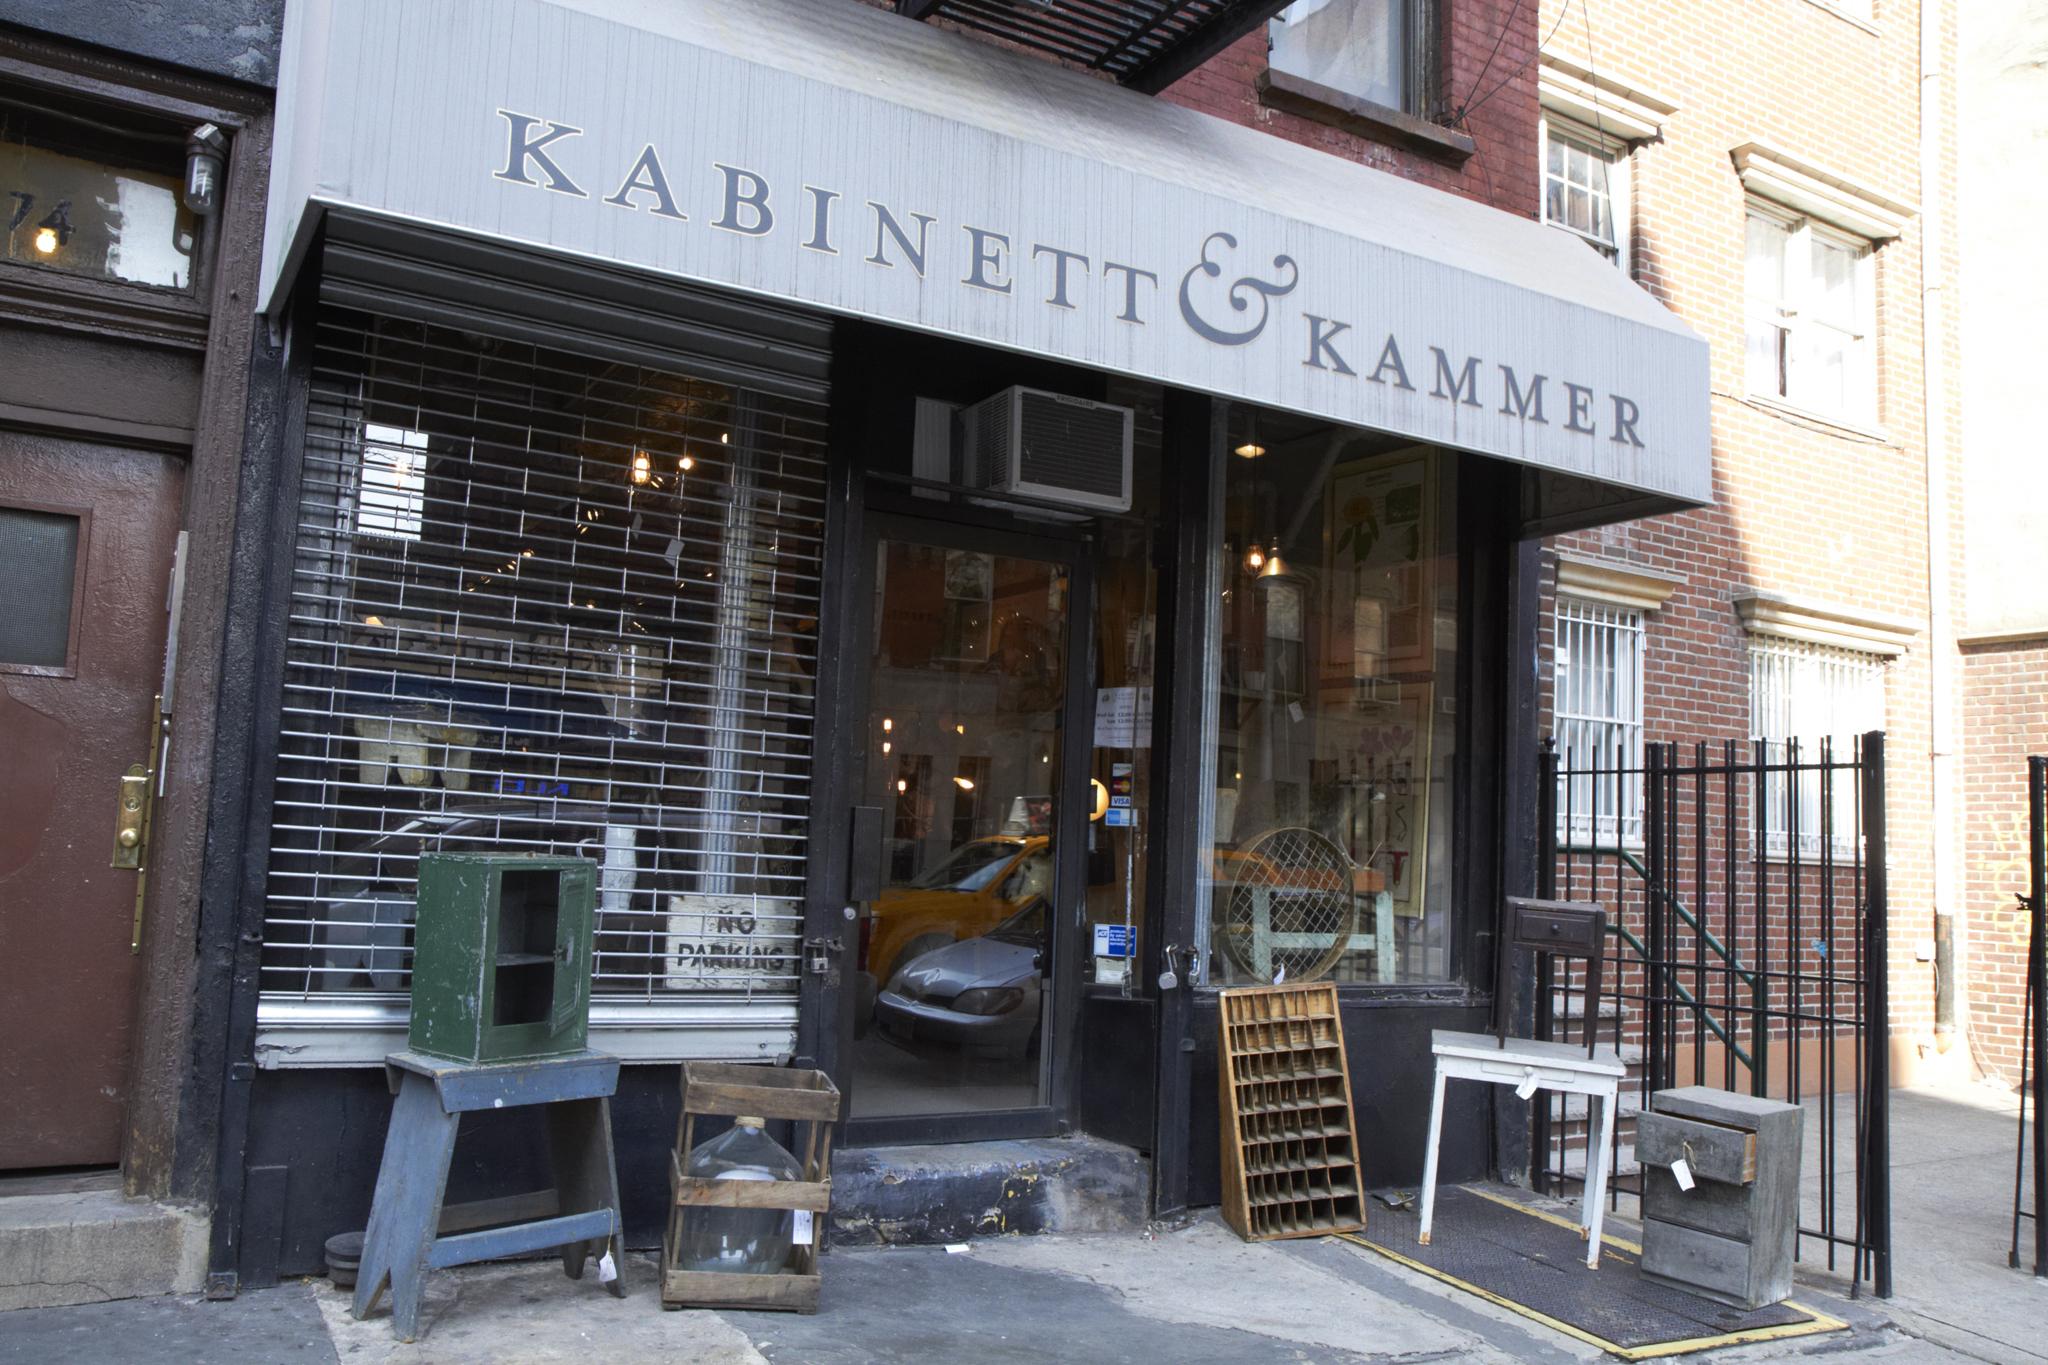 Kabinett & Kammer (CLOSED)